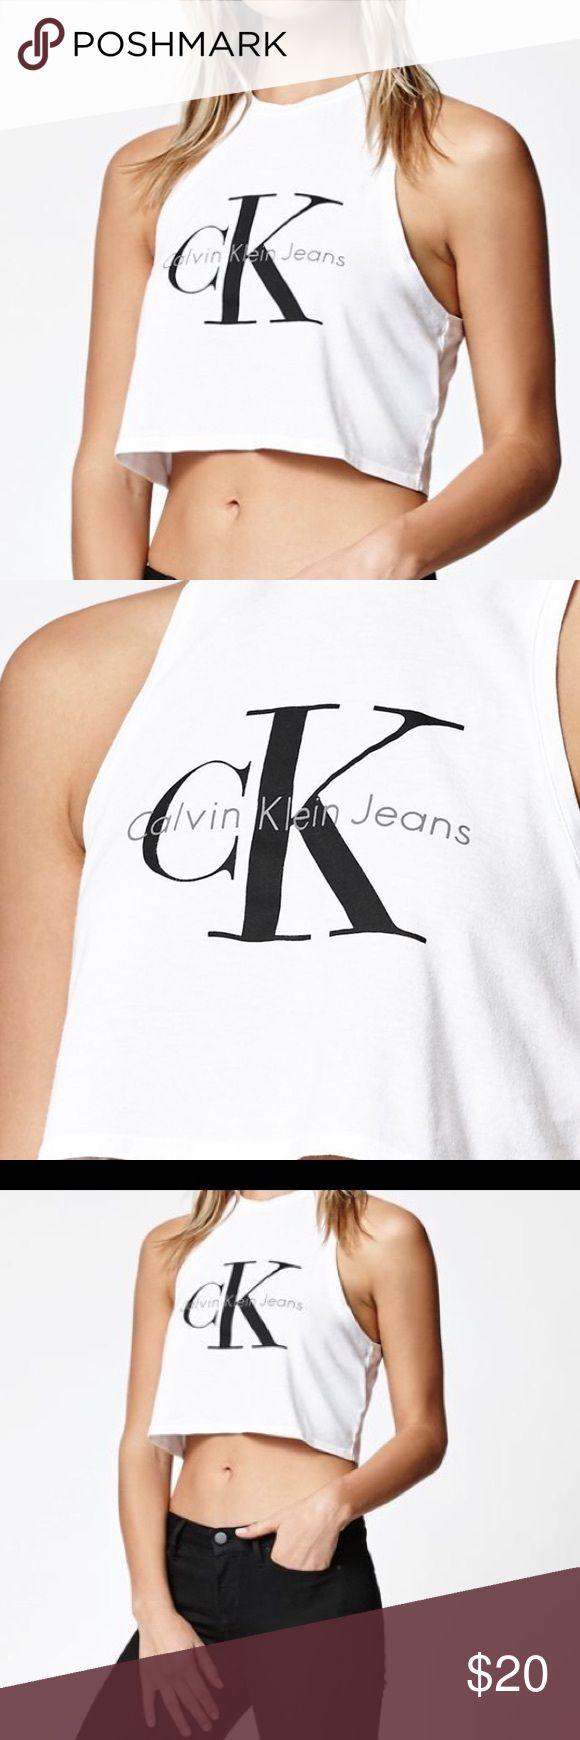 CK Calvin Klein Crop Top Never worn!!! Brand new!!! White ck crop top. M/l Calvin Klein Tops Crop Tops